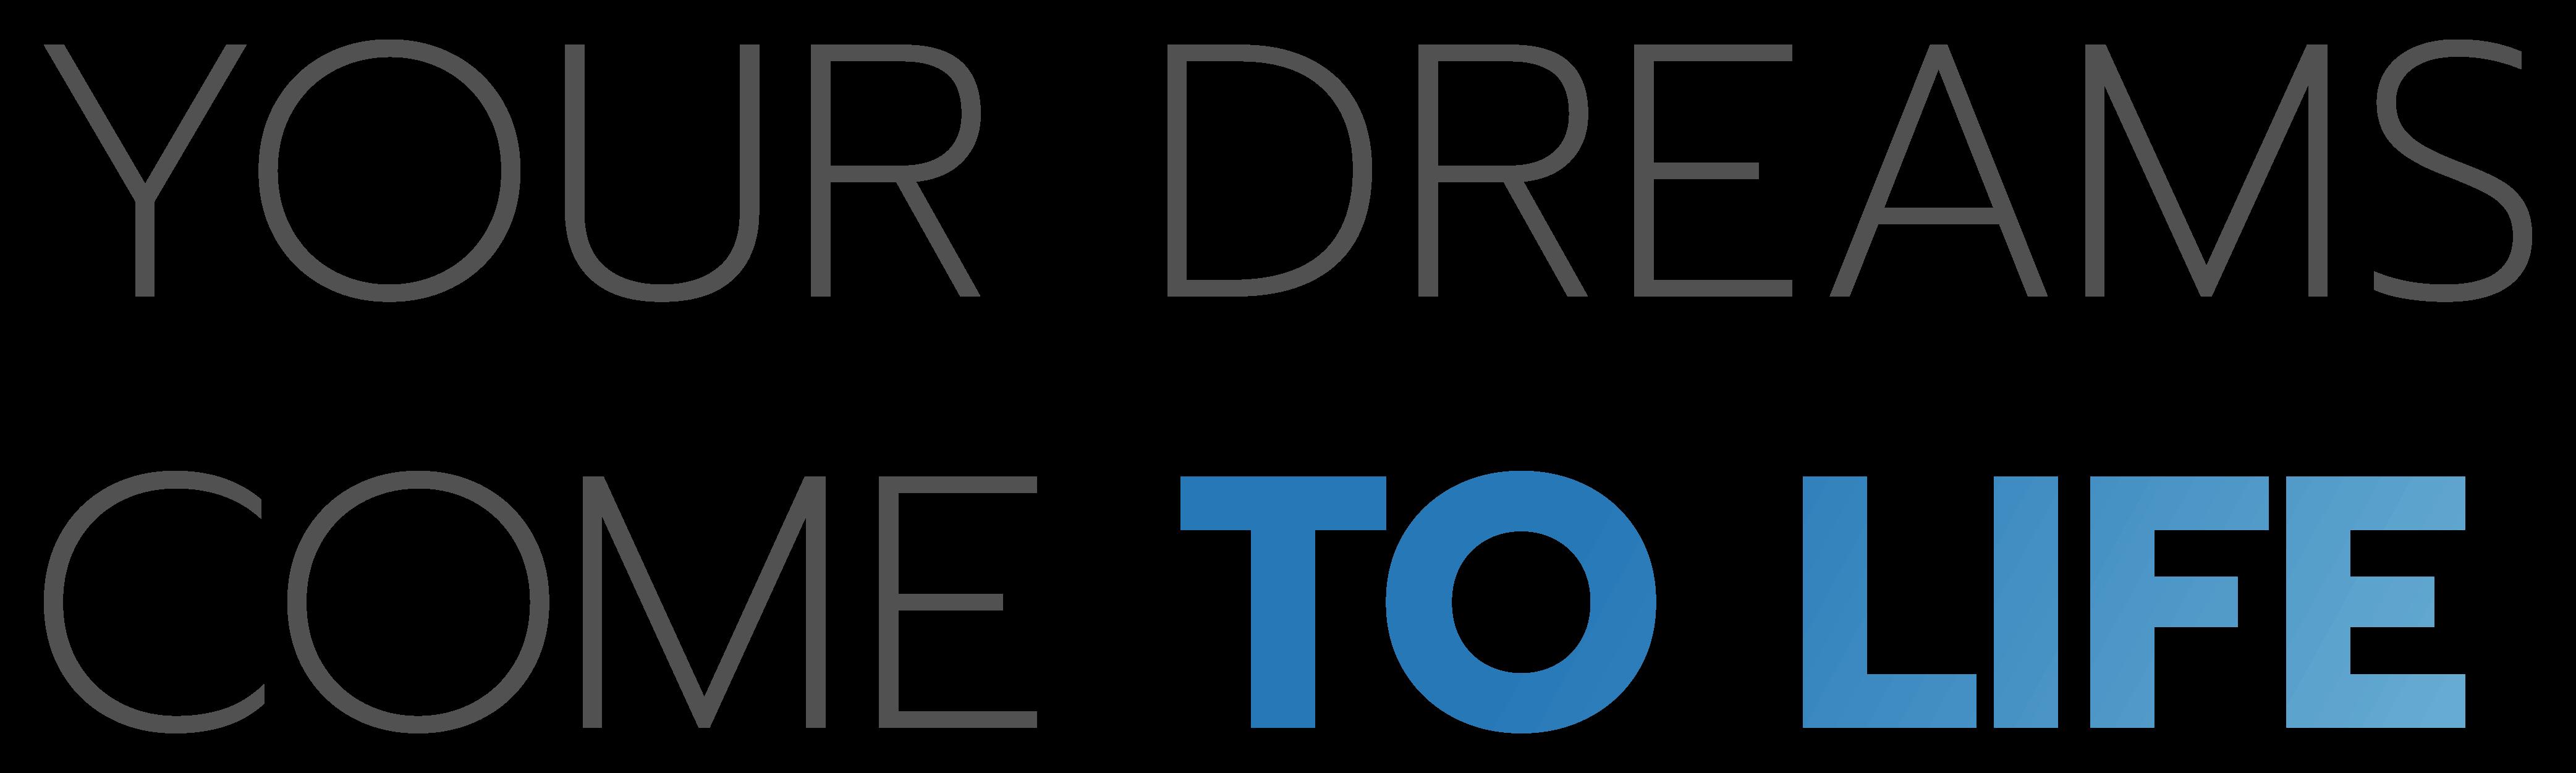 LC Social Impact_Banner_V.03_enjoy dreams come to life (1)